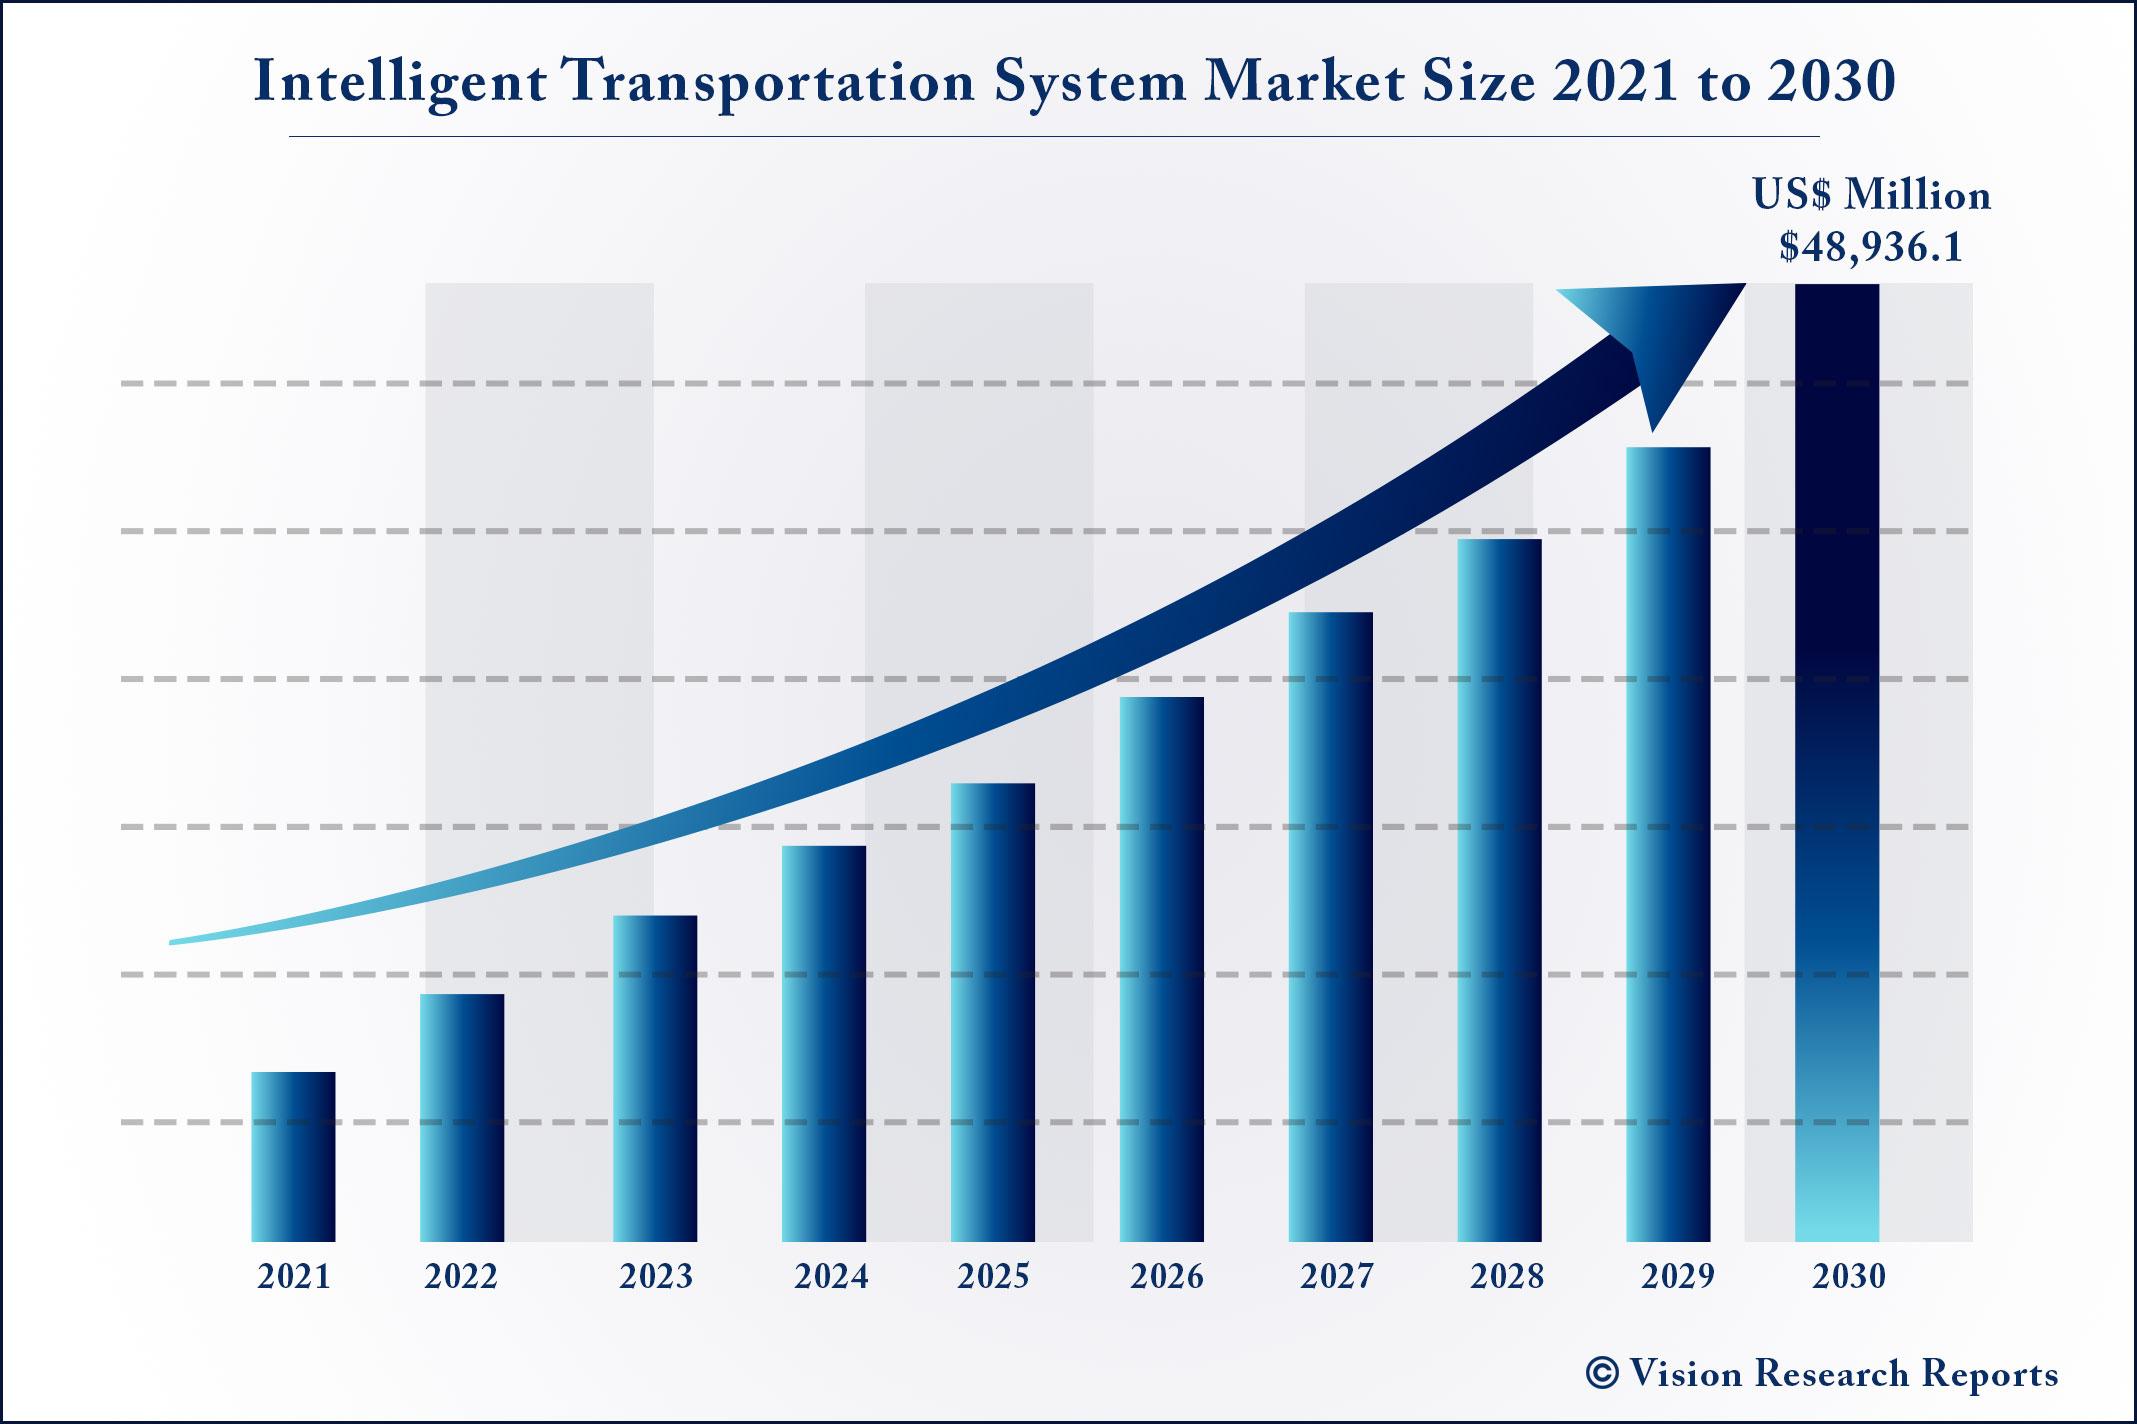 Intelligent Transportation System Market Size 2021 to 2030